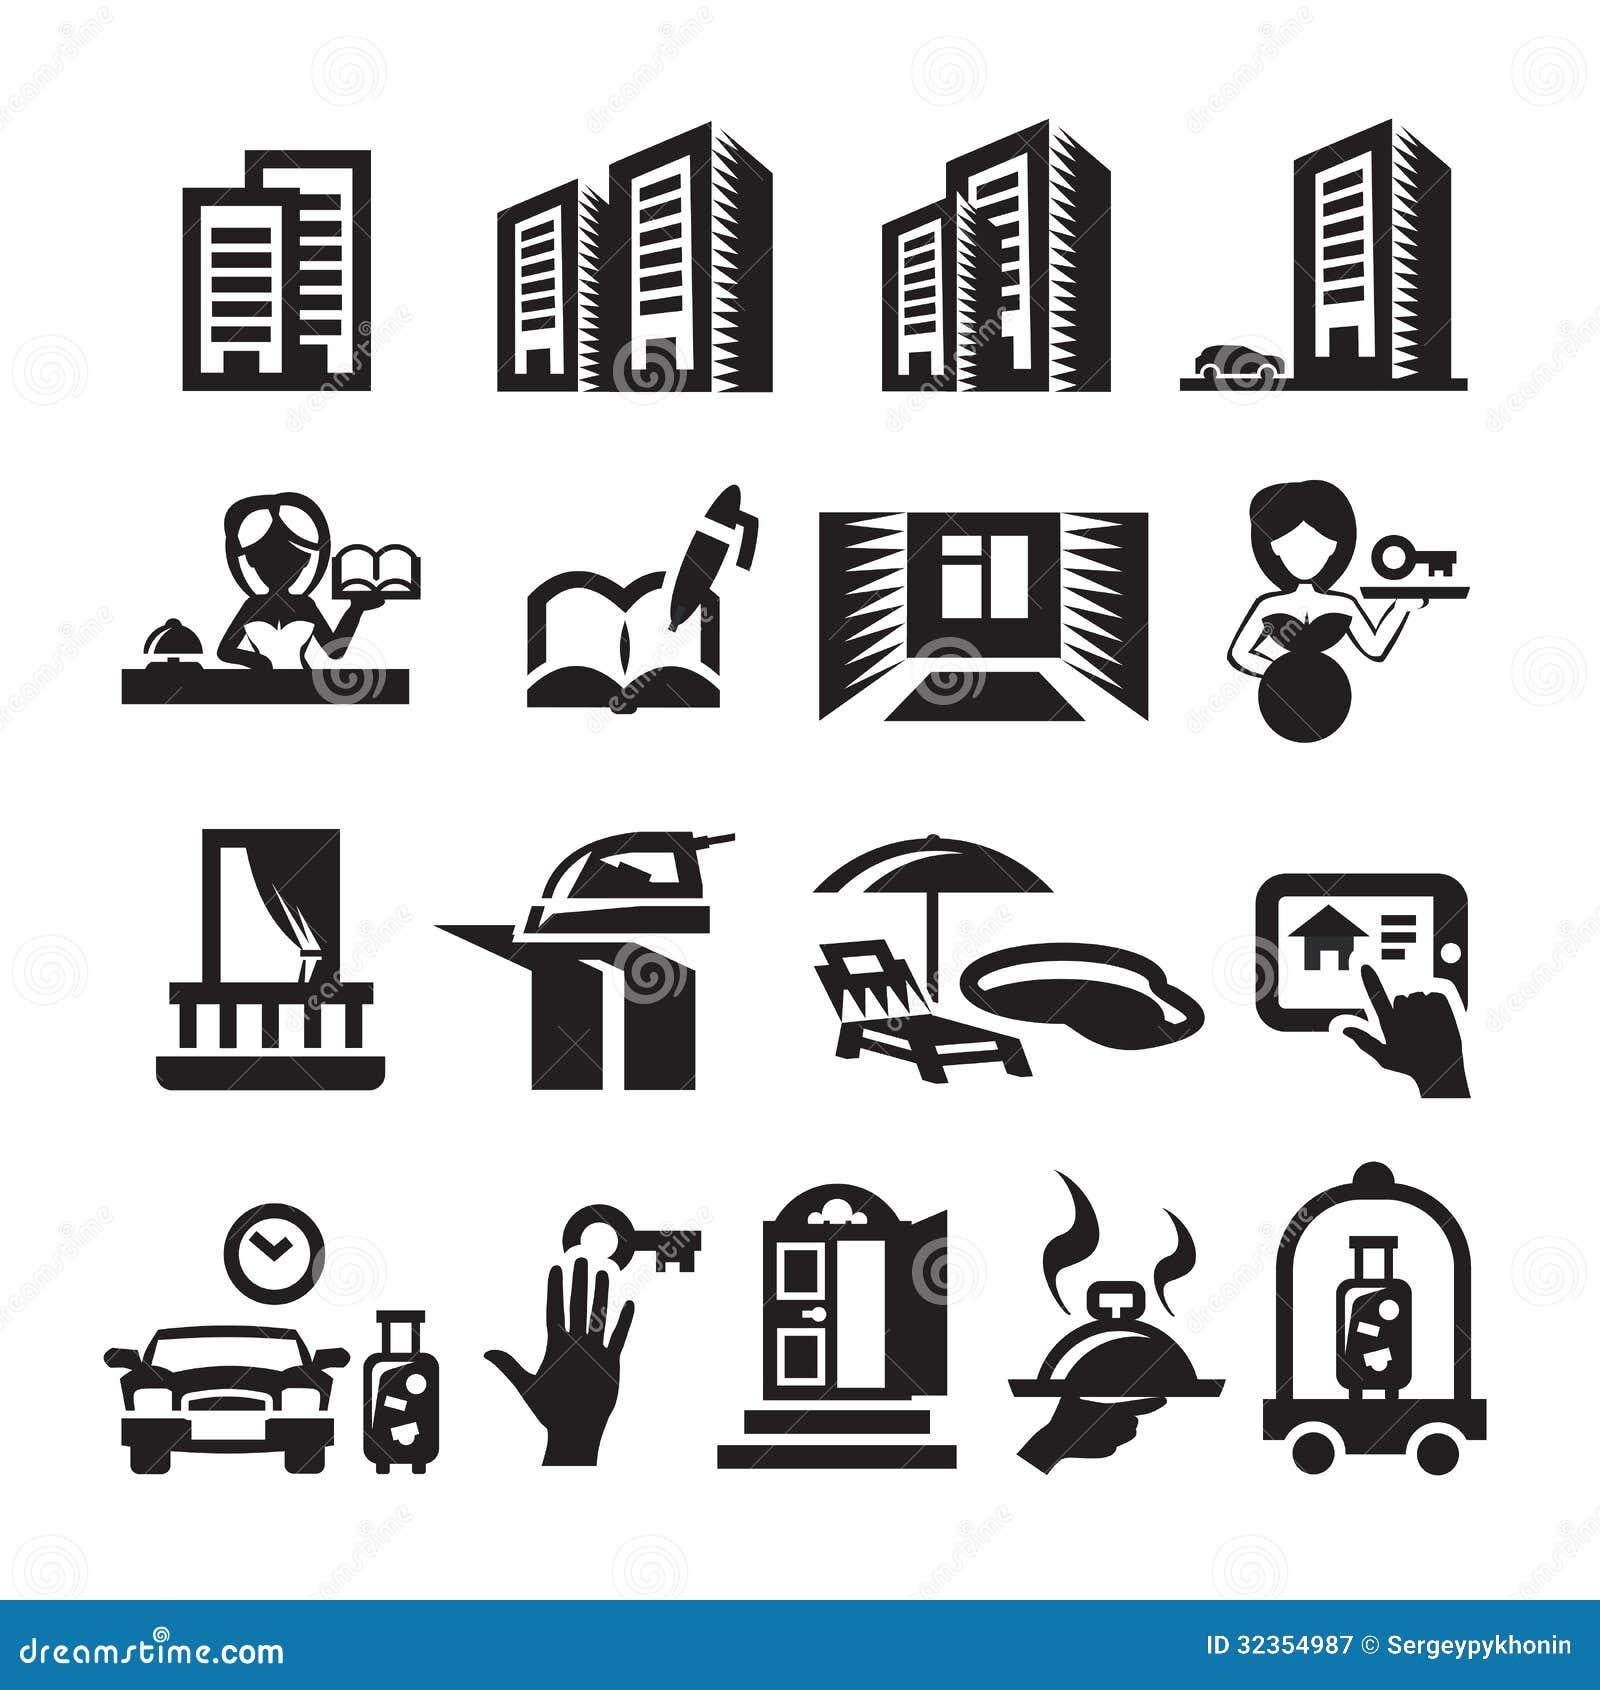 Hotel icons stock vector. Illustration of balcony, door ...